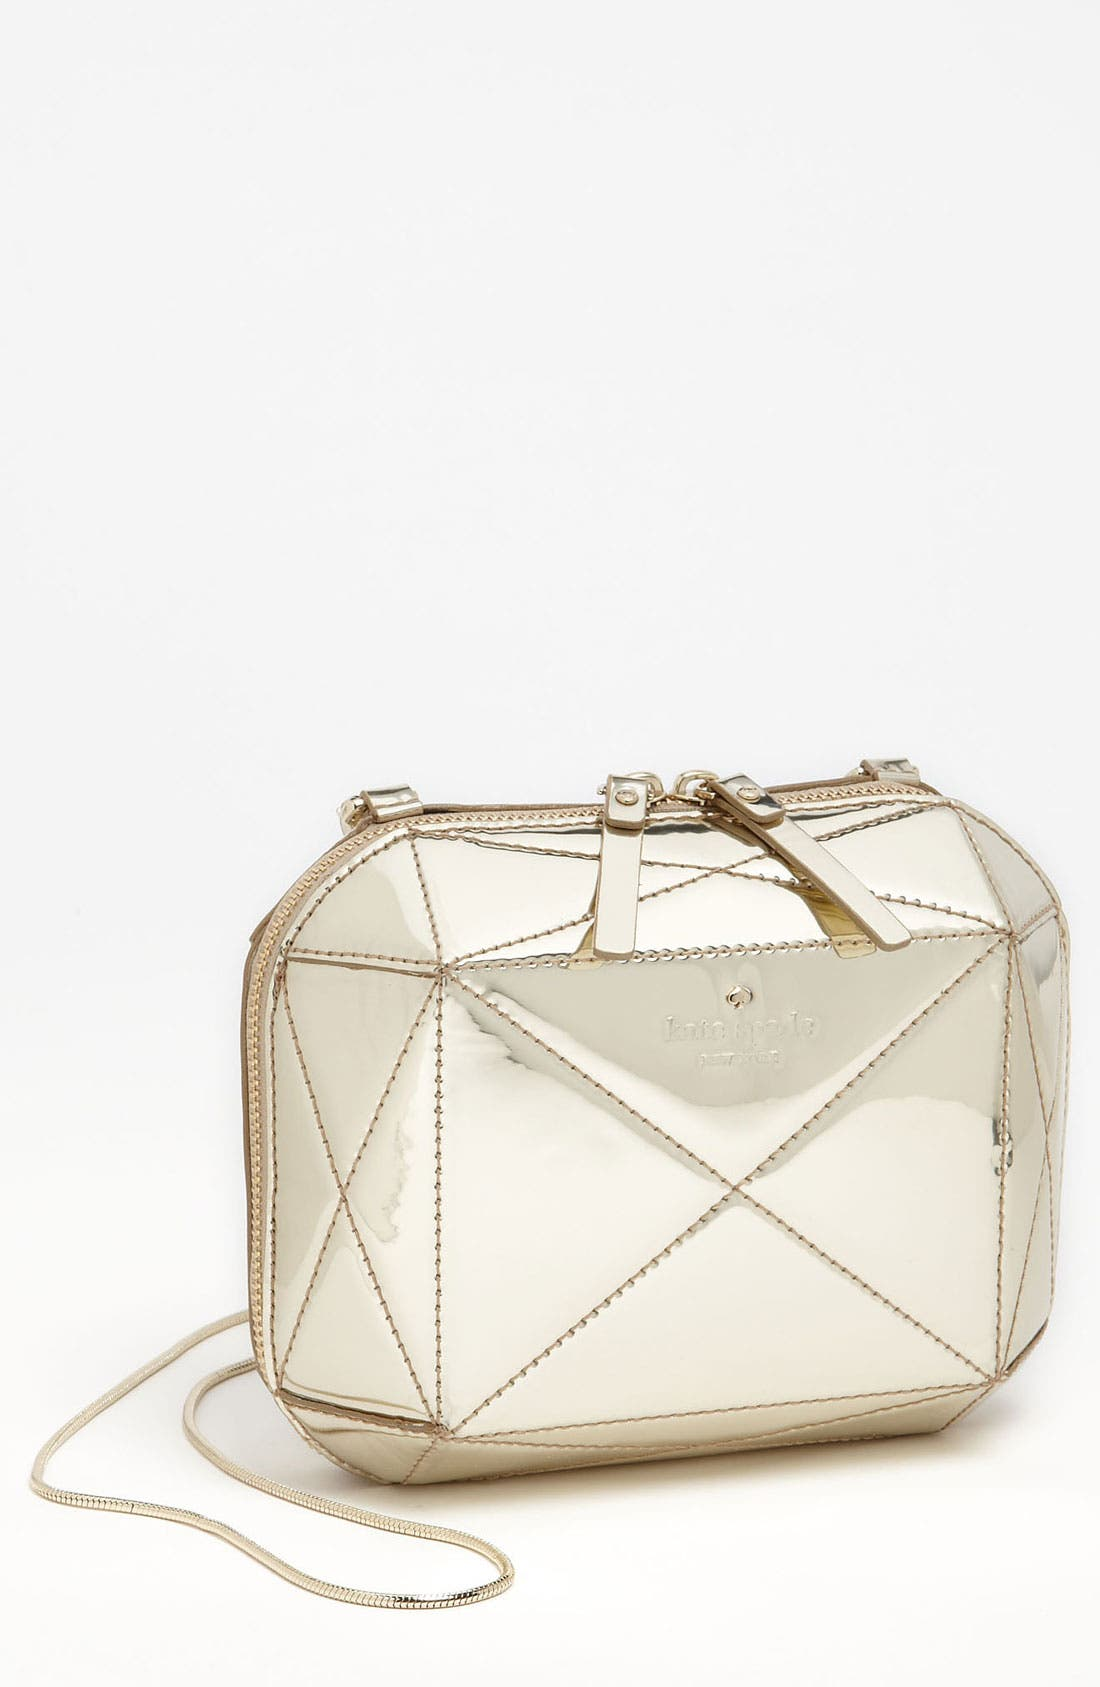 Alternate Image 1 Selected - kate spade new york 'icebox jewels' crossbody bag